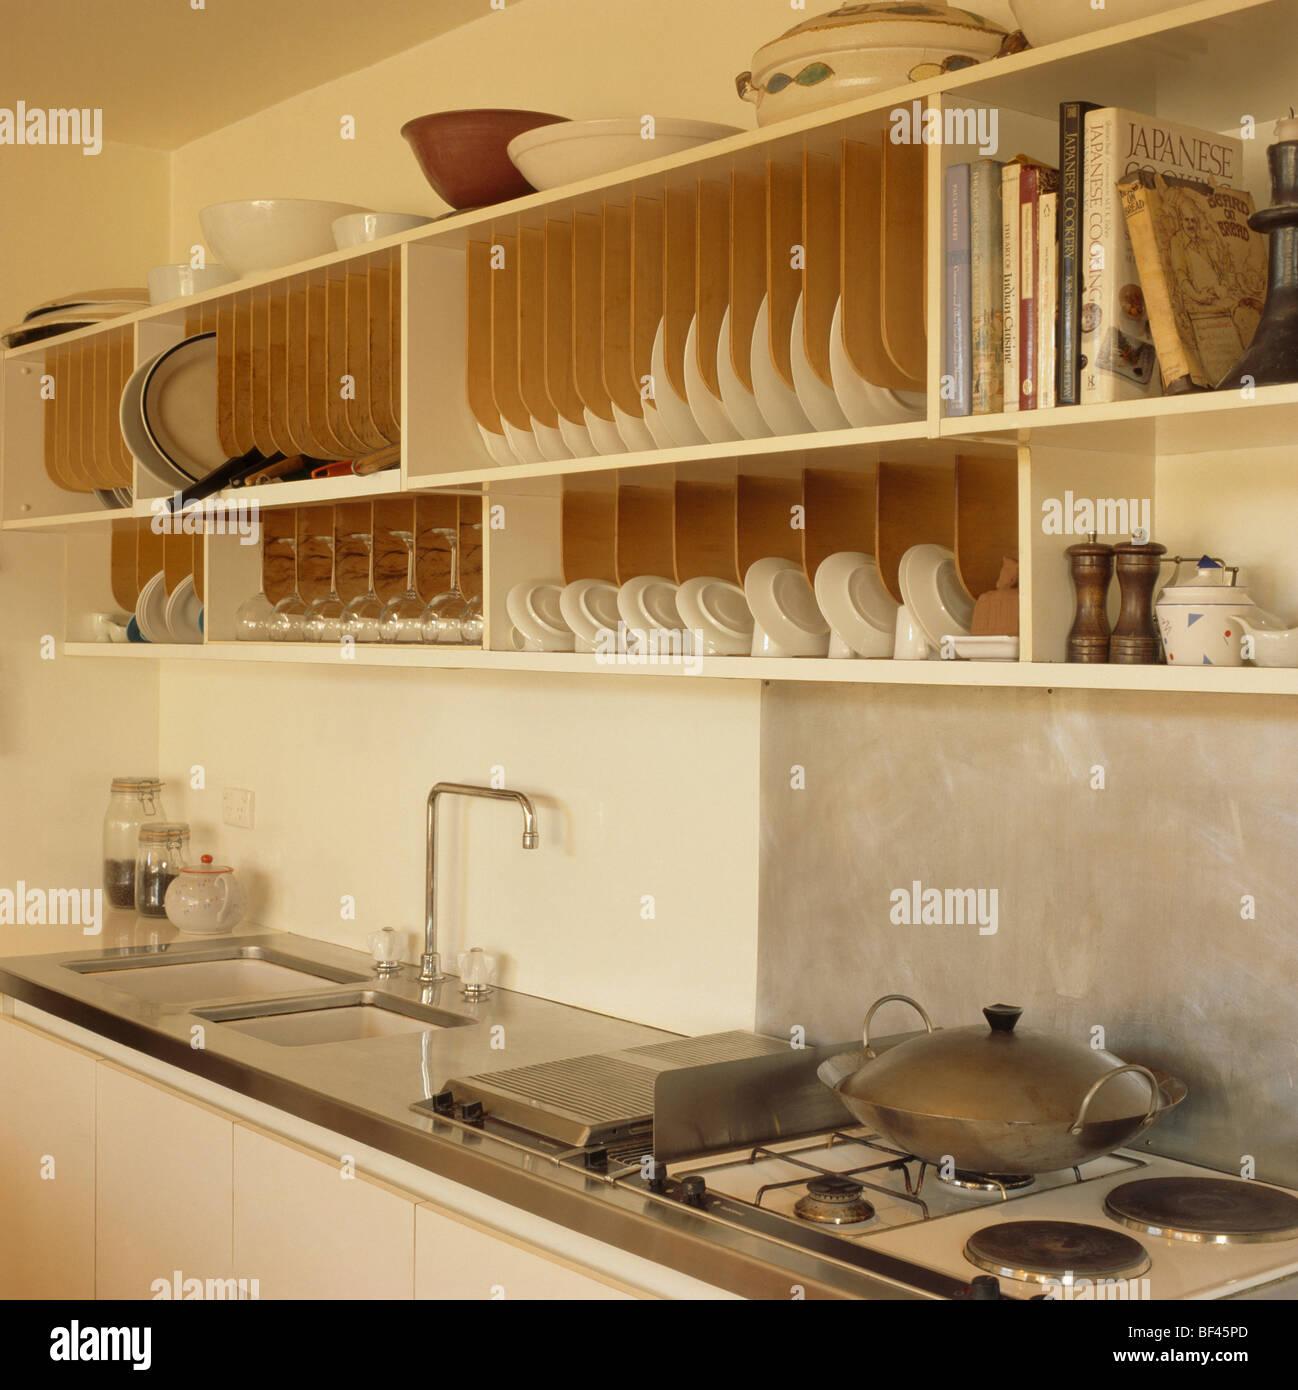 Shelves Above Kitchen Sink Stockfotos & Shelves Above Kitchen Sink ...